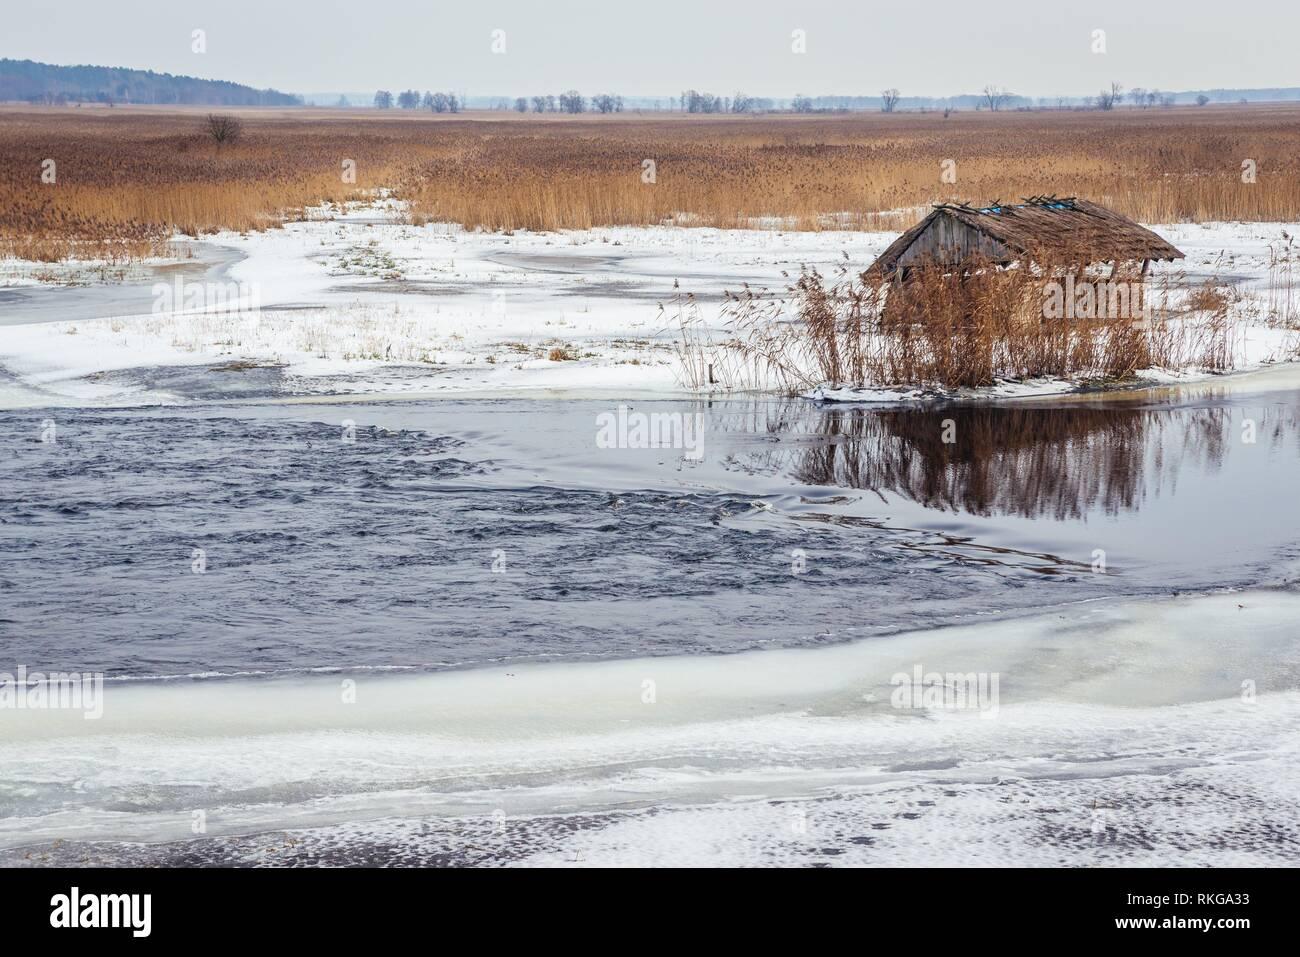 Hay rack on a frozen braided channel of Narew River in Waniewo village, Wysokie Mazowieckie County in Podlaskie Voivodeship of northeastern Poland. - Stock Image